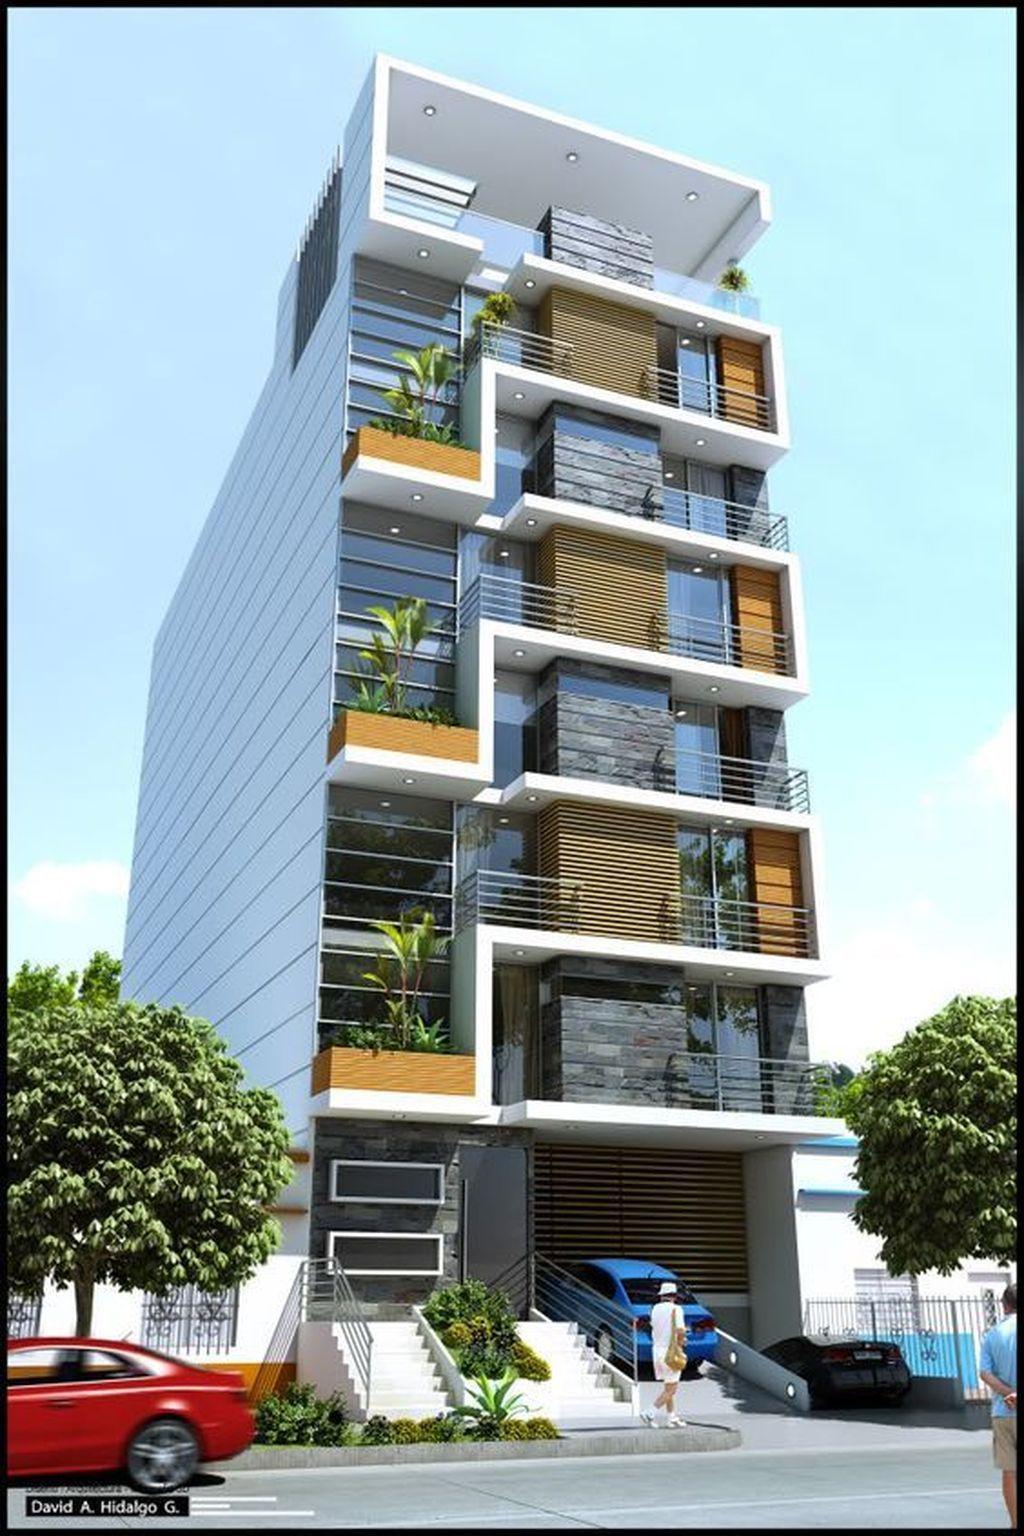 Nice 40 Amazing Apartment Building Facade Architecture Design More At Https Hom Apartment Architecture Architecture Building Design Small Apartment Building